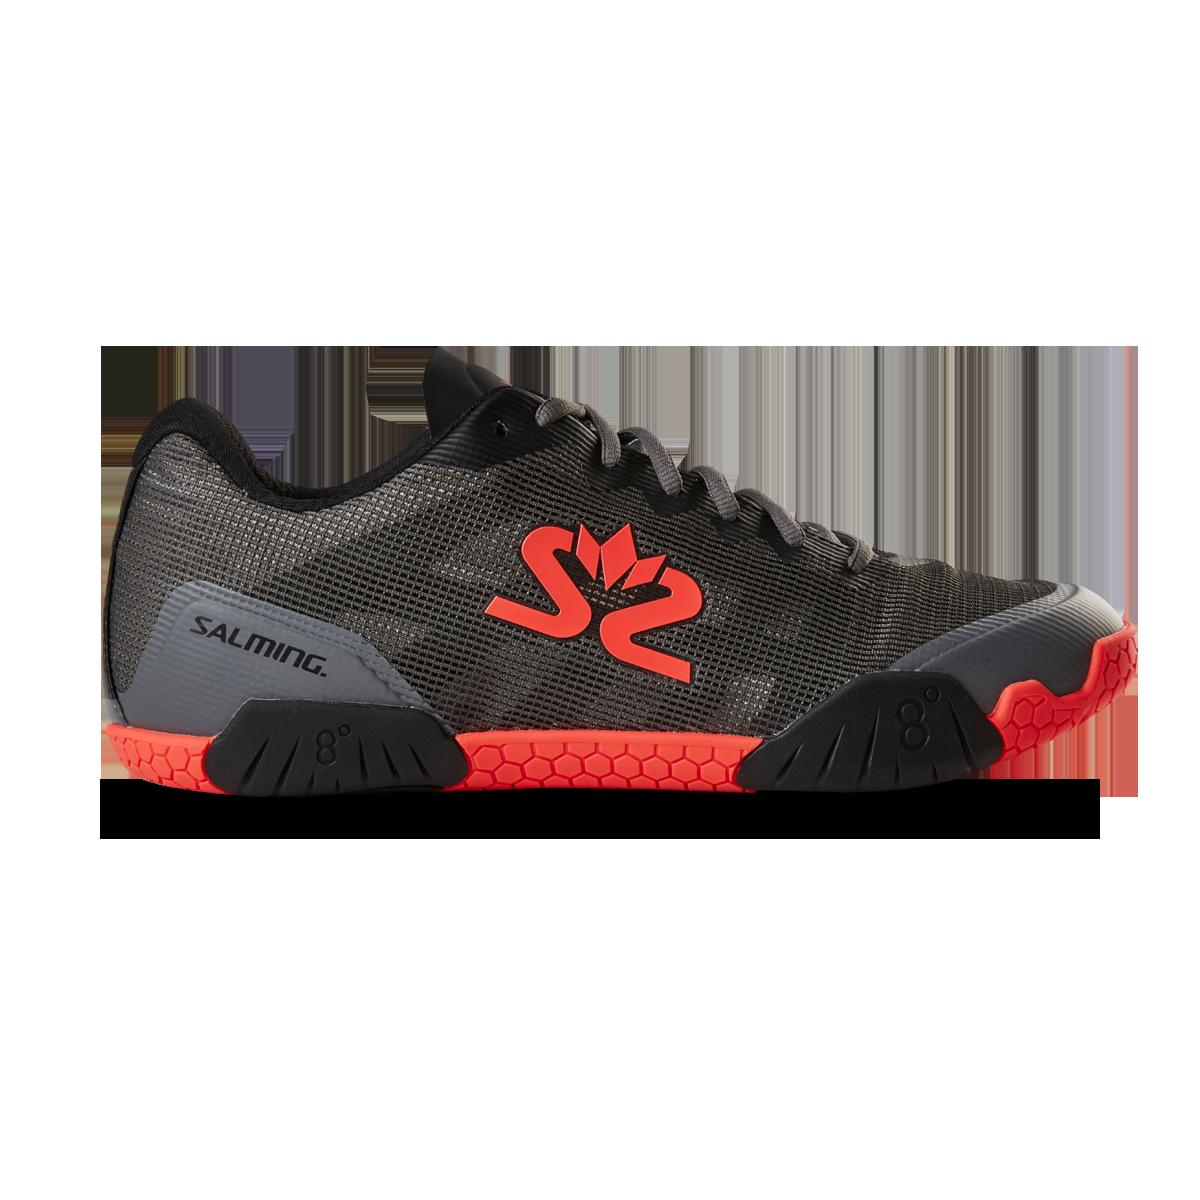 Salming Hawk Men's Squash Shoe - Just